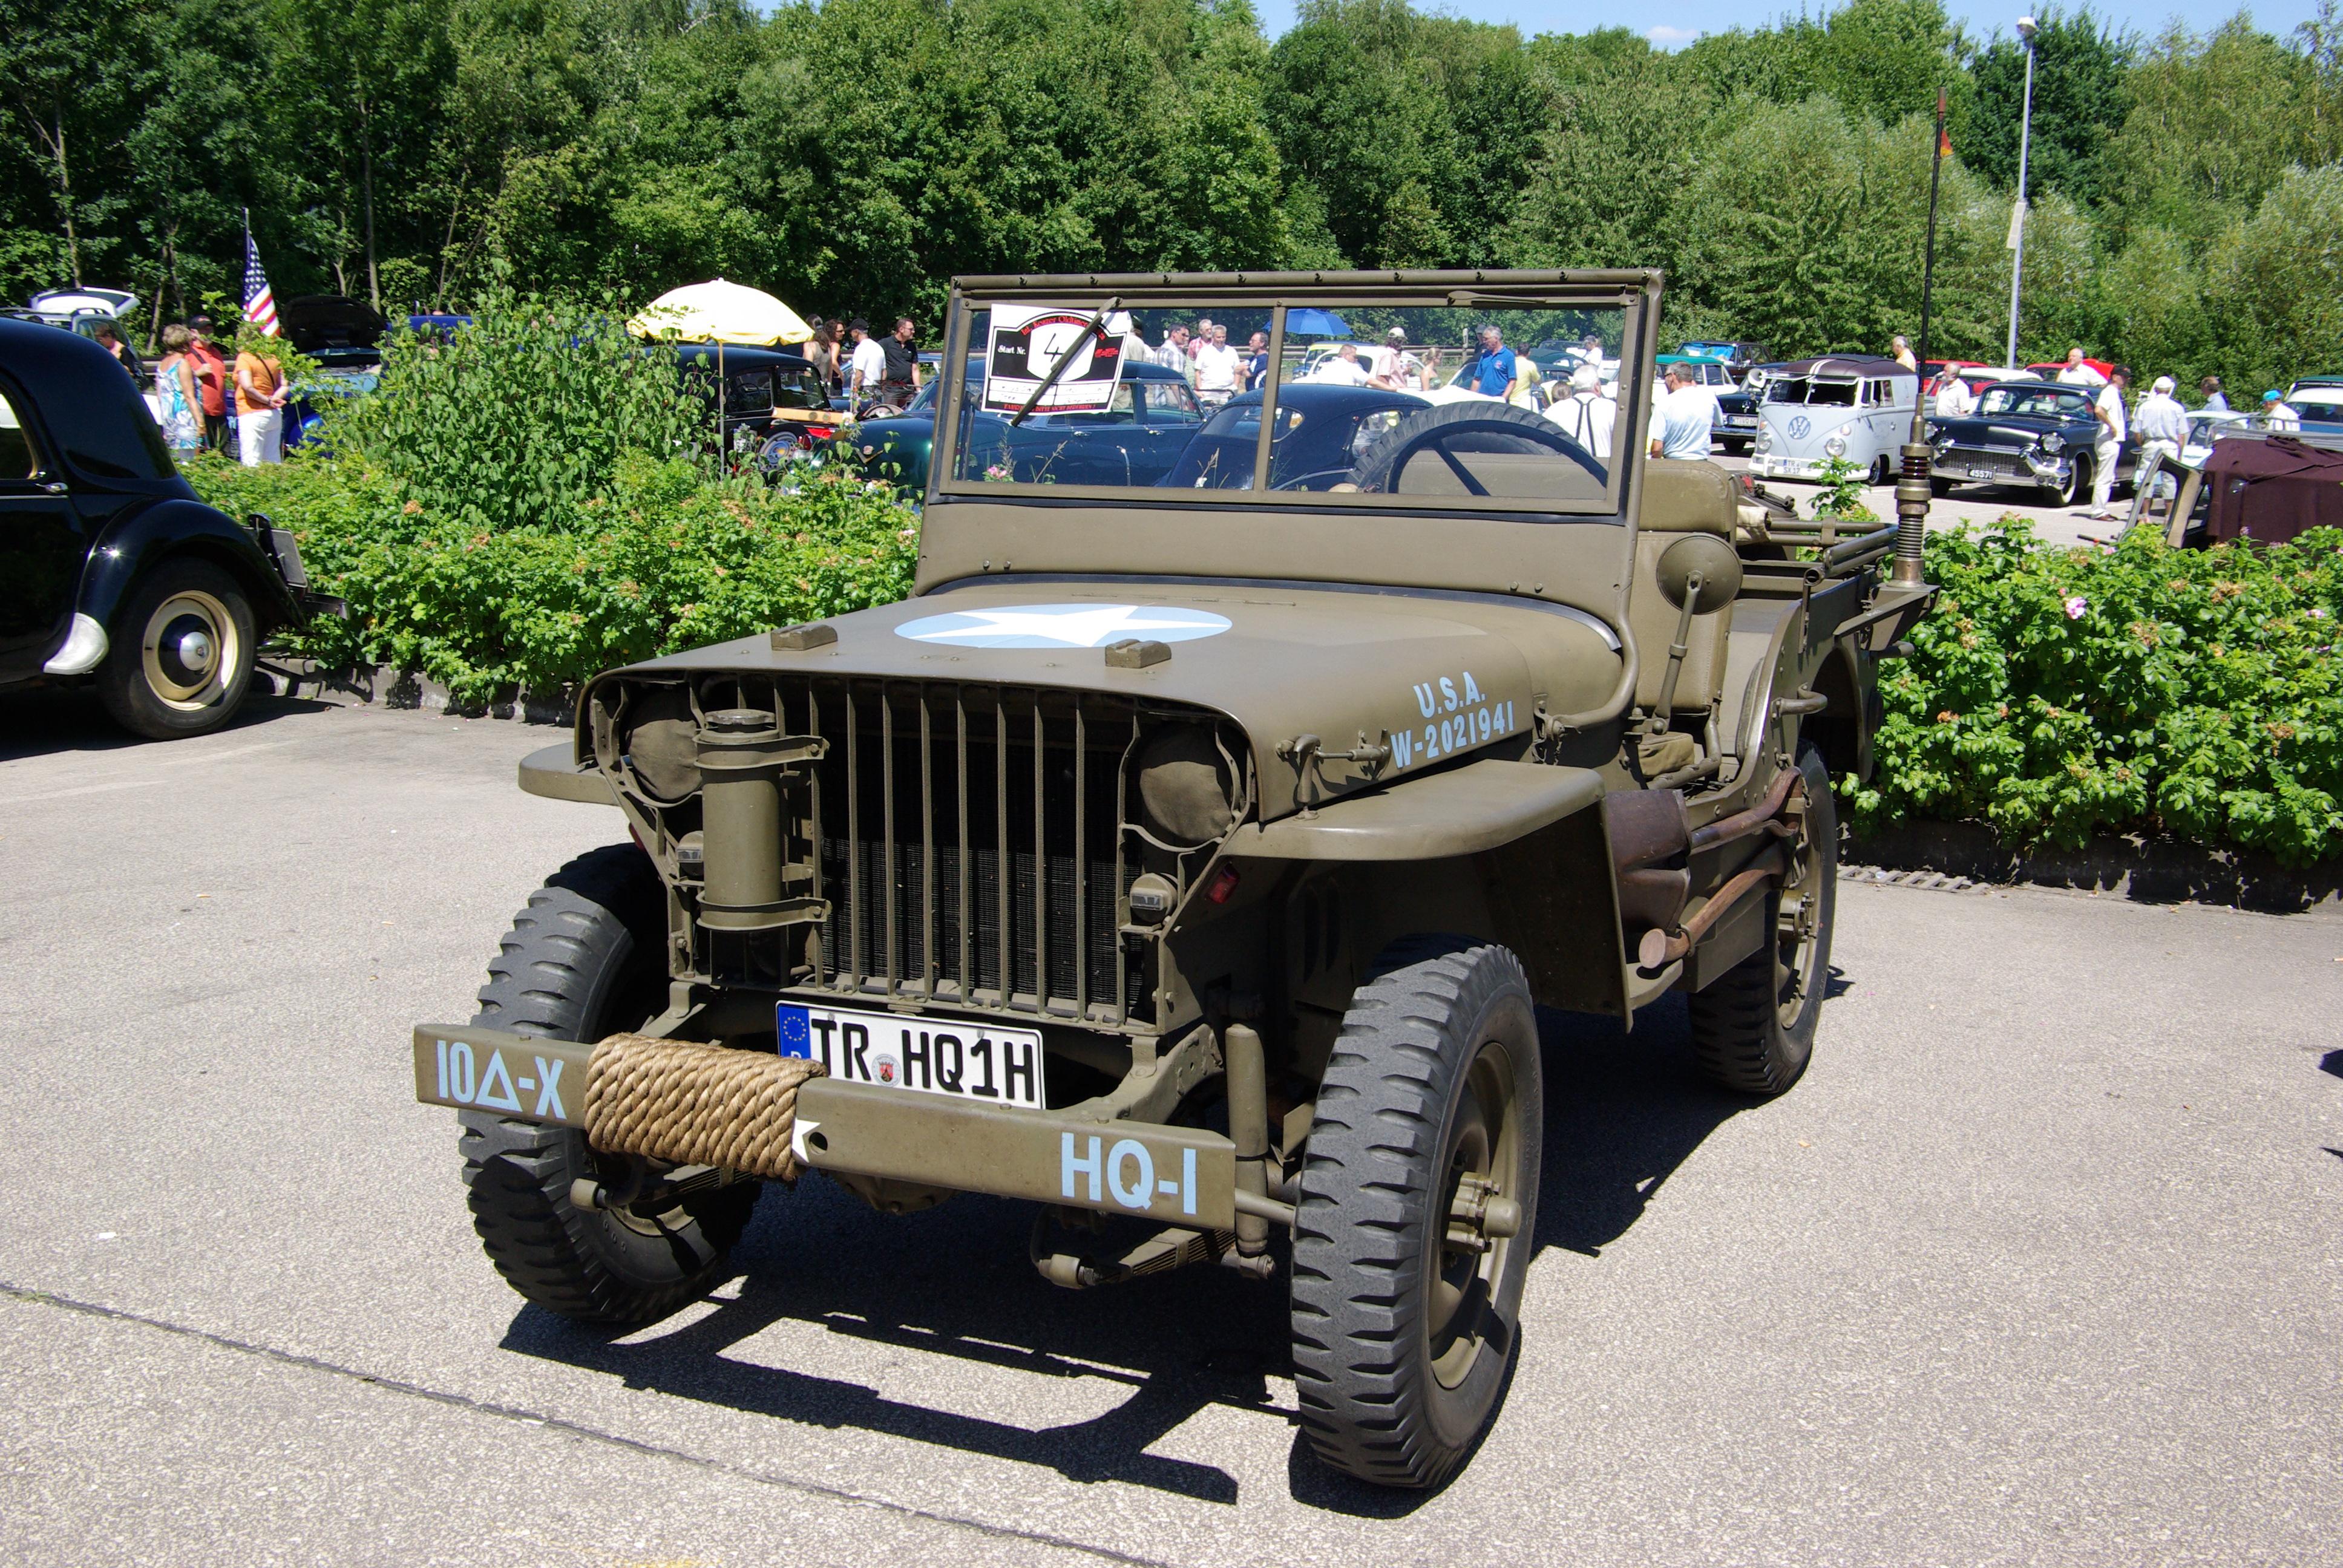 Willys Related Imagesstart 0 Weili Automotive Network 1959 Wagon Wiring Diagram Description Jeep Bw 1